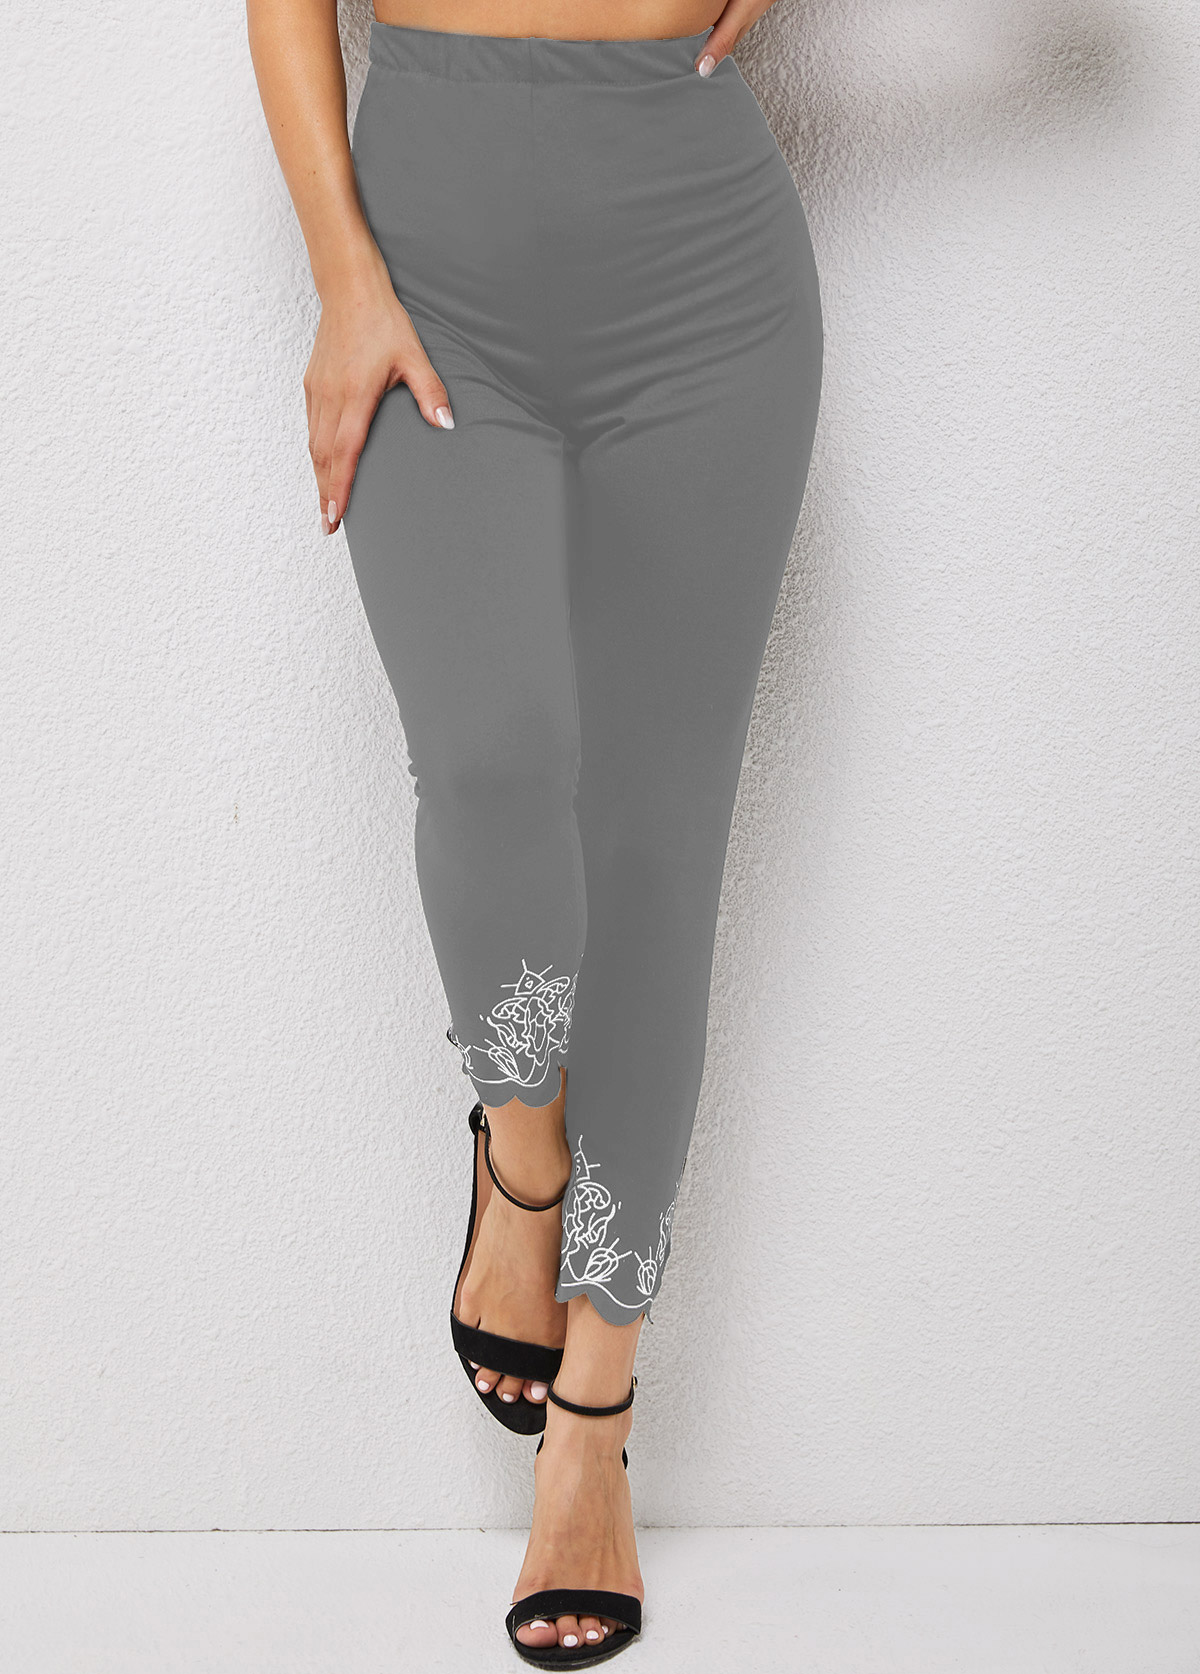 High Waisted Pierced Skinny Printed Pants